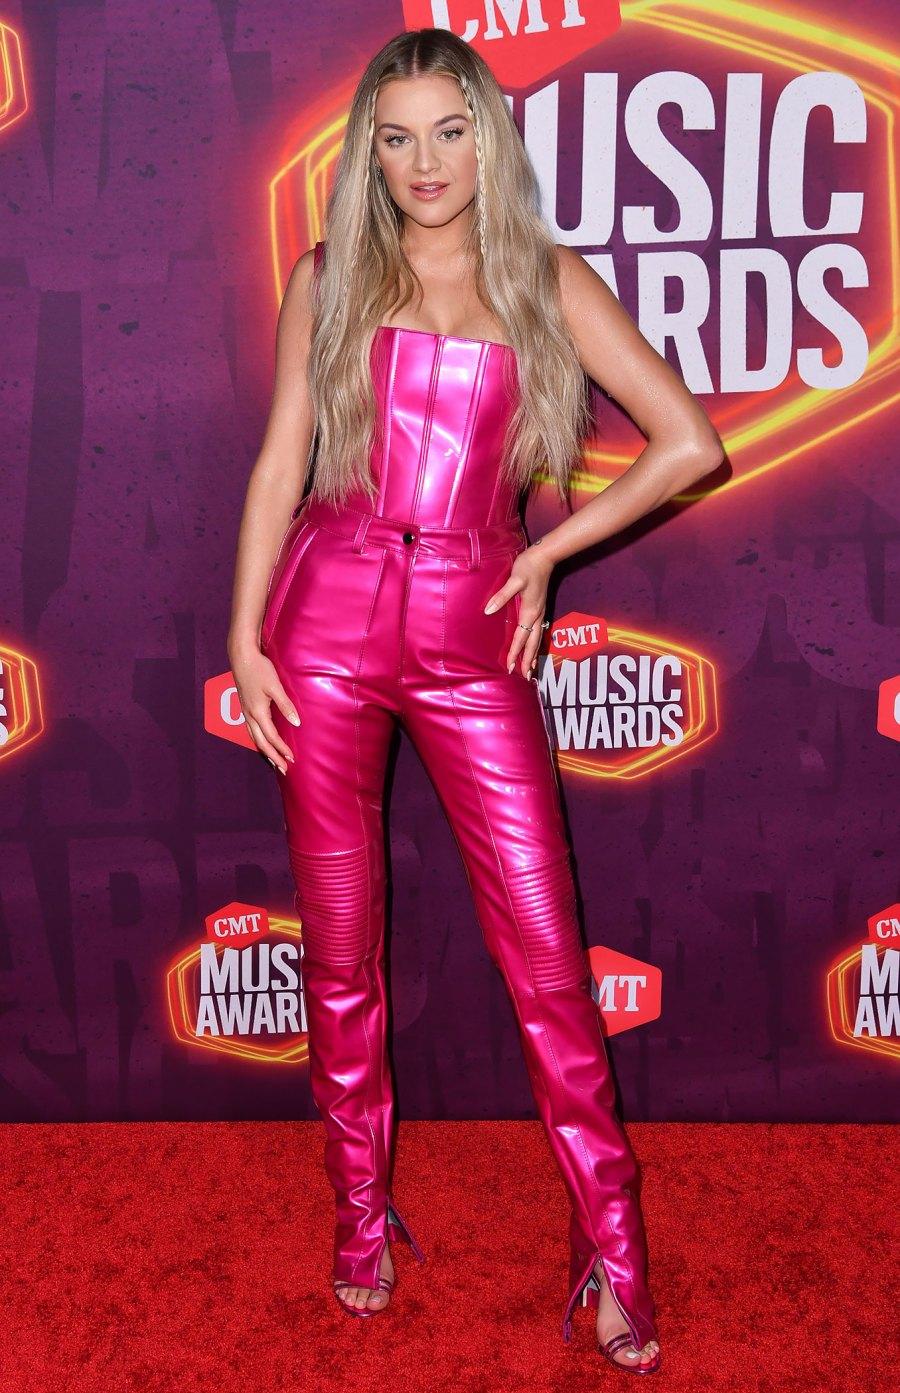 CMT Music Awards 2021 Red Carpet Arrivals - Kelsea Ballerini